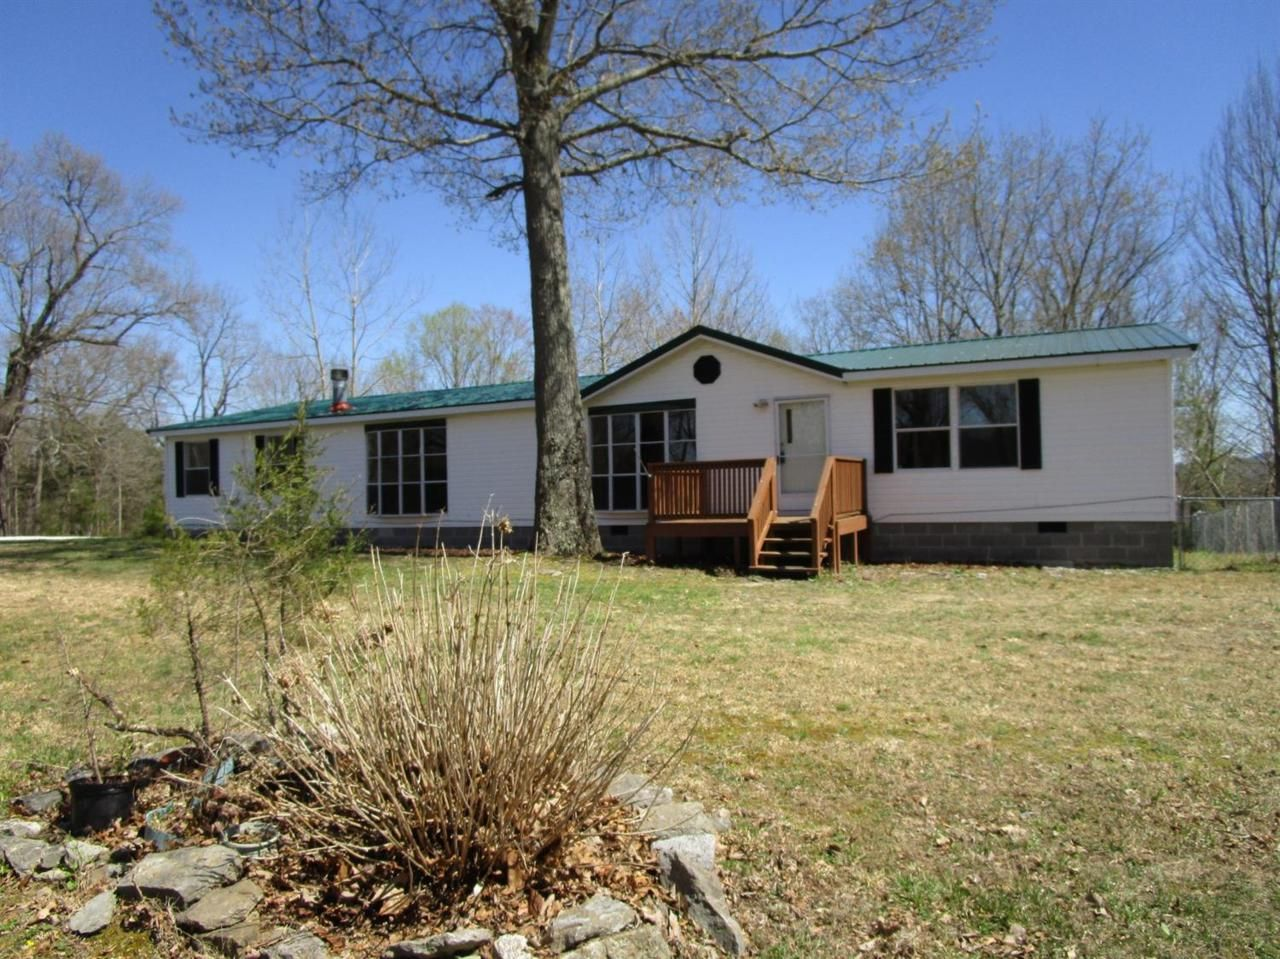 3910 pine ridge road pine ridge ridge road house styles